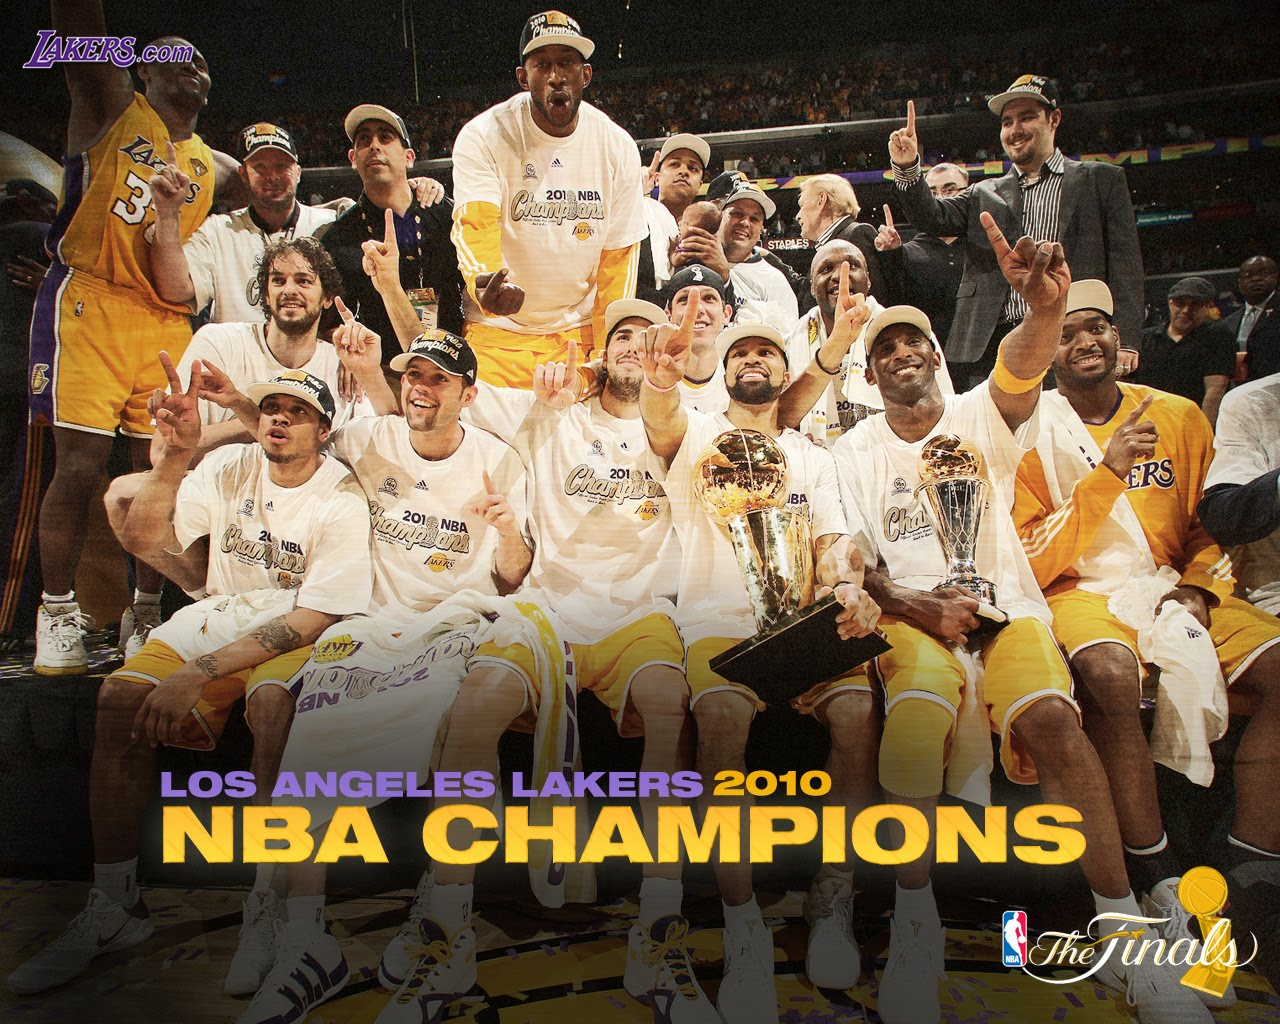 https://i2.wp.com/3.bp.blogspot.com/_1H9fbwR7liM/TMa-Wx2r2UI/AAAAAAAAA9E/Q2T4XSL0yHo/s1600/Lakers+2010+Champions+wallpaper.jpg?resize=567%2C455